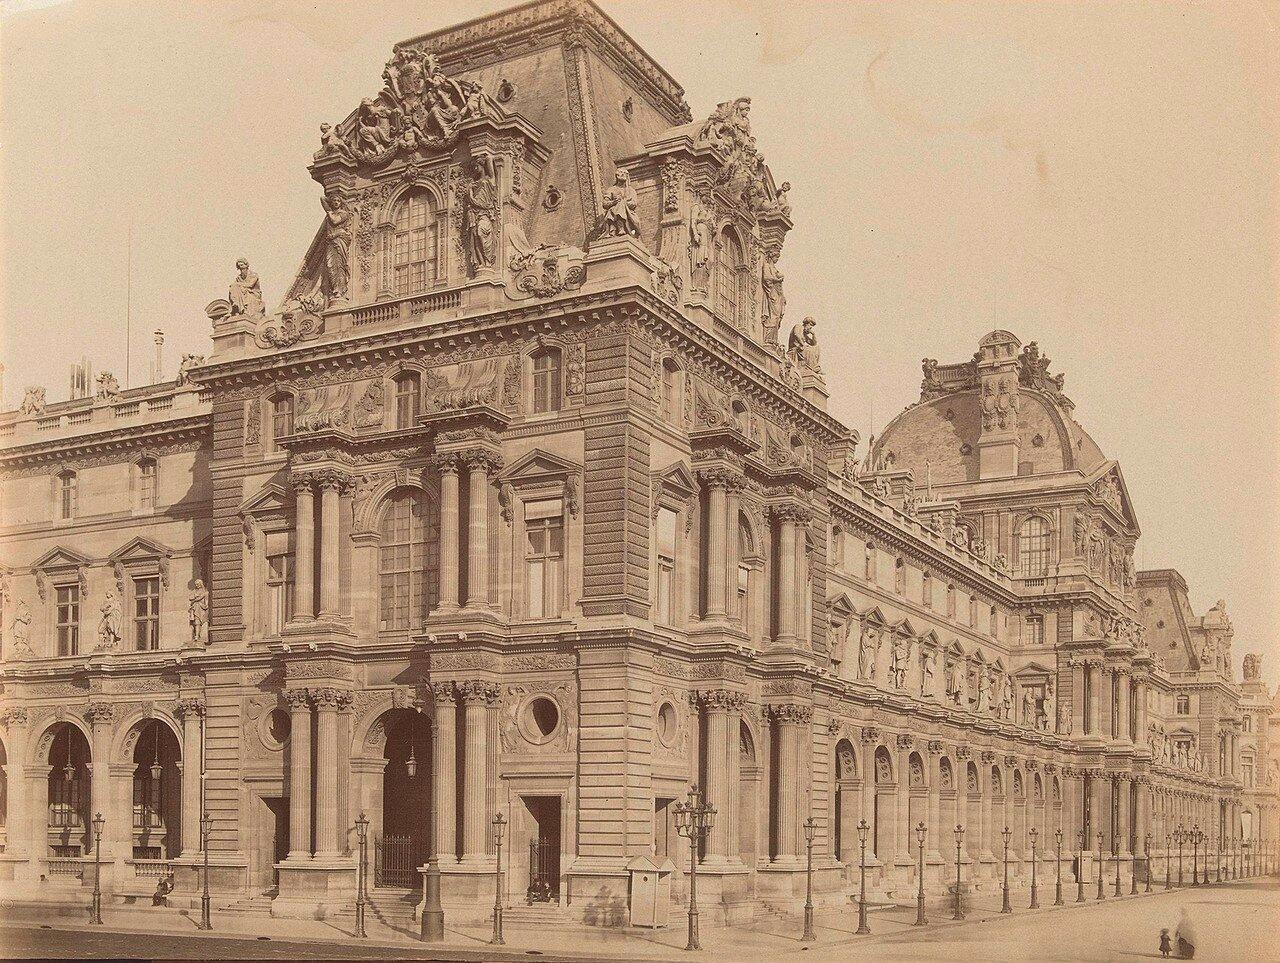 1860-е. Лувр. Павильон Тюрго